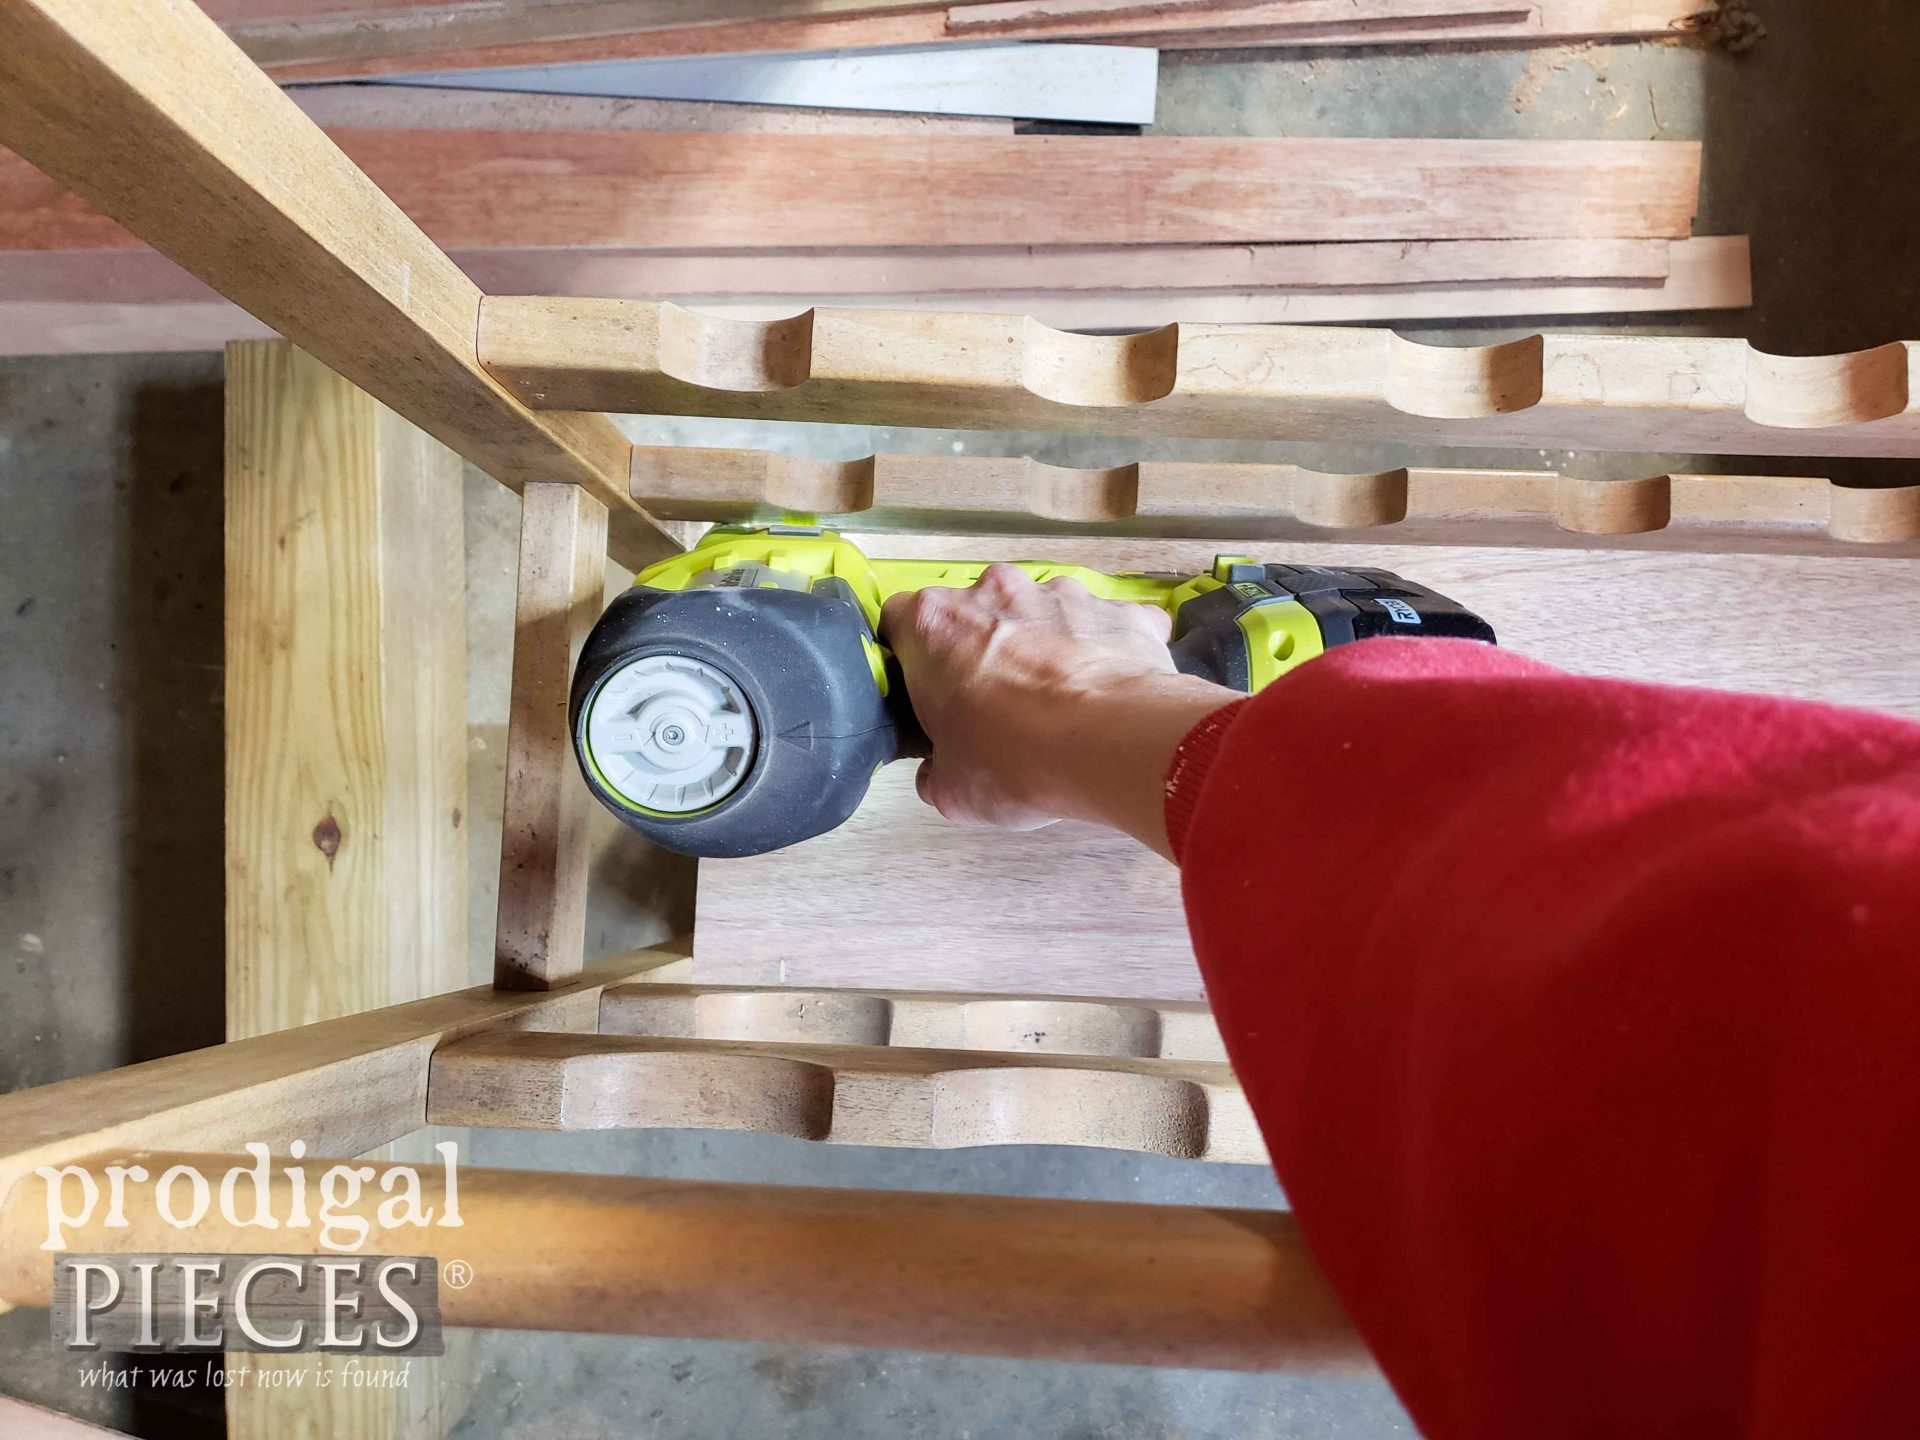 Stapling Shelf Wood to Upcycle Wine Rack with Ryobi Stapler by Larissa of Prodigal Pieces | prodigalpieces.com